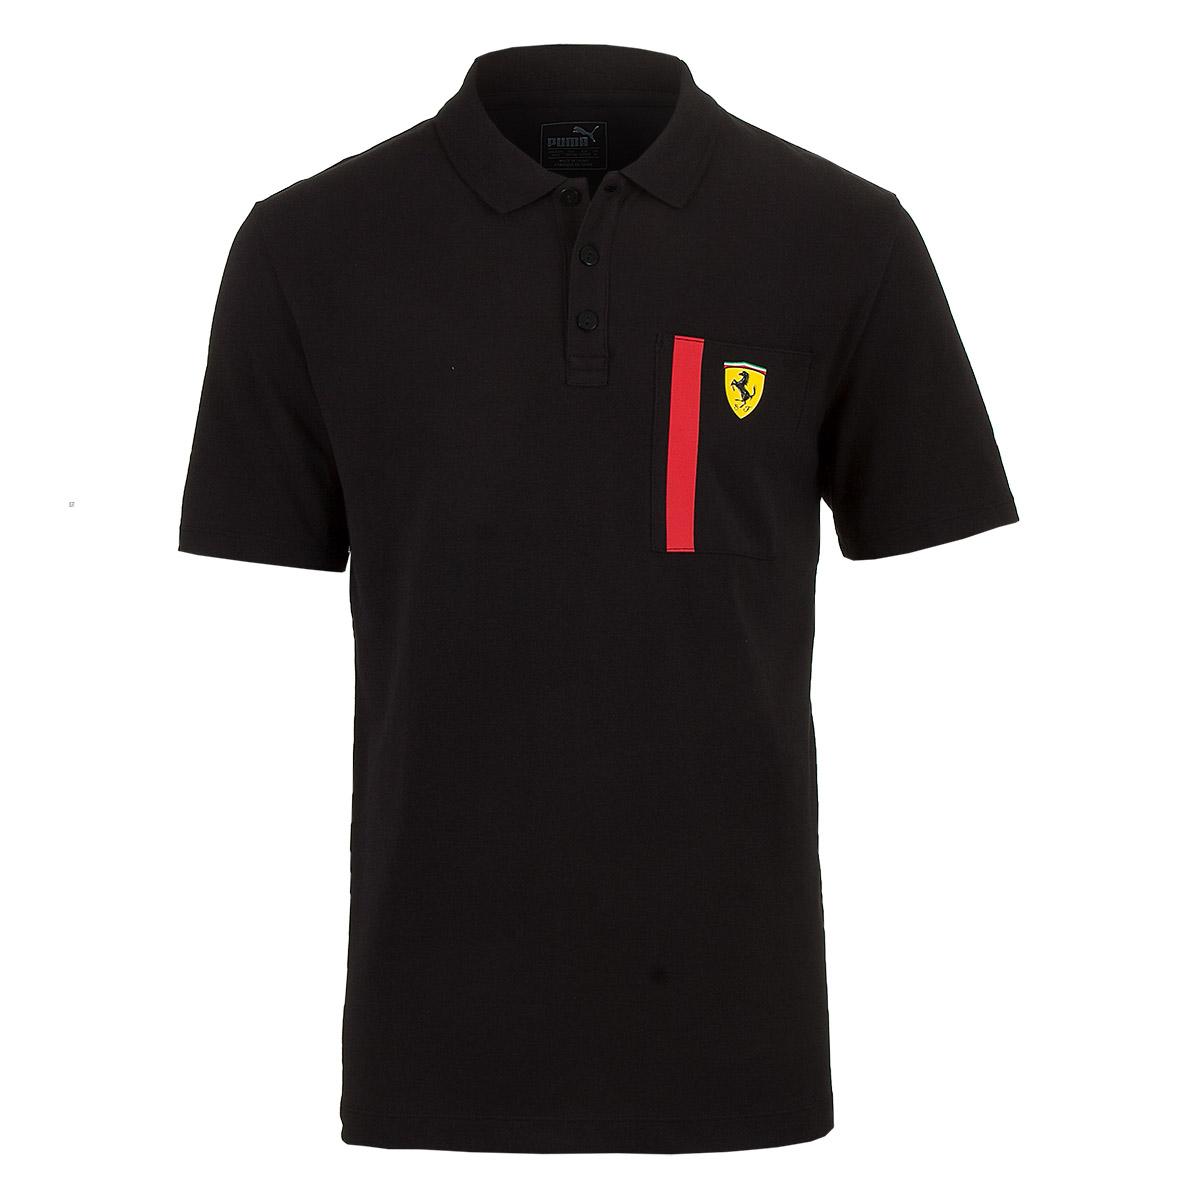 Camisa Polo Masc. Puma Styfr Scuderia Ferrari - Preto